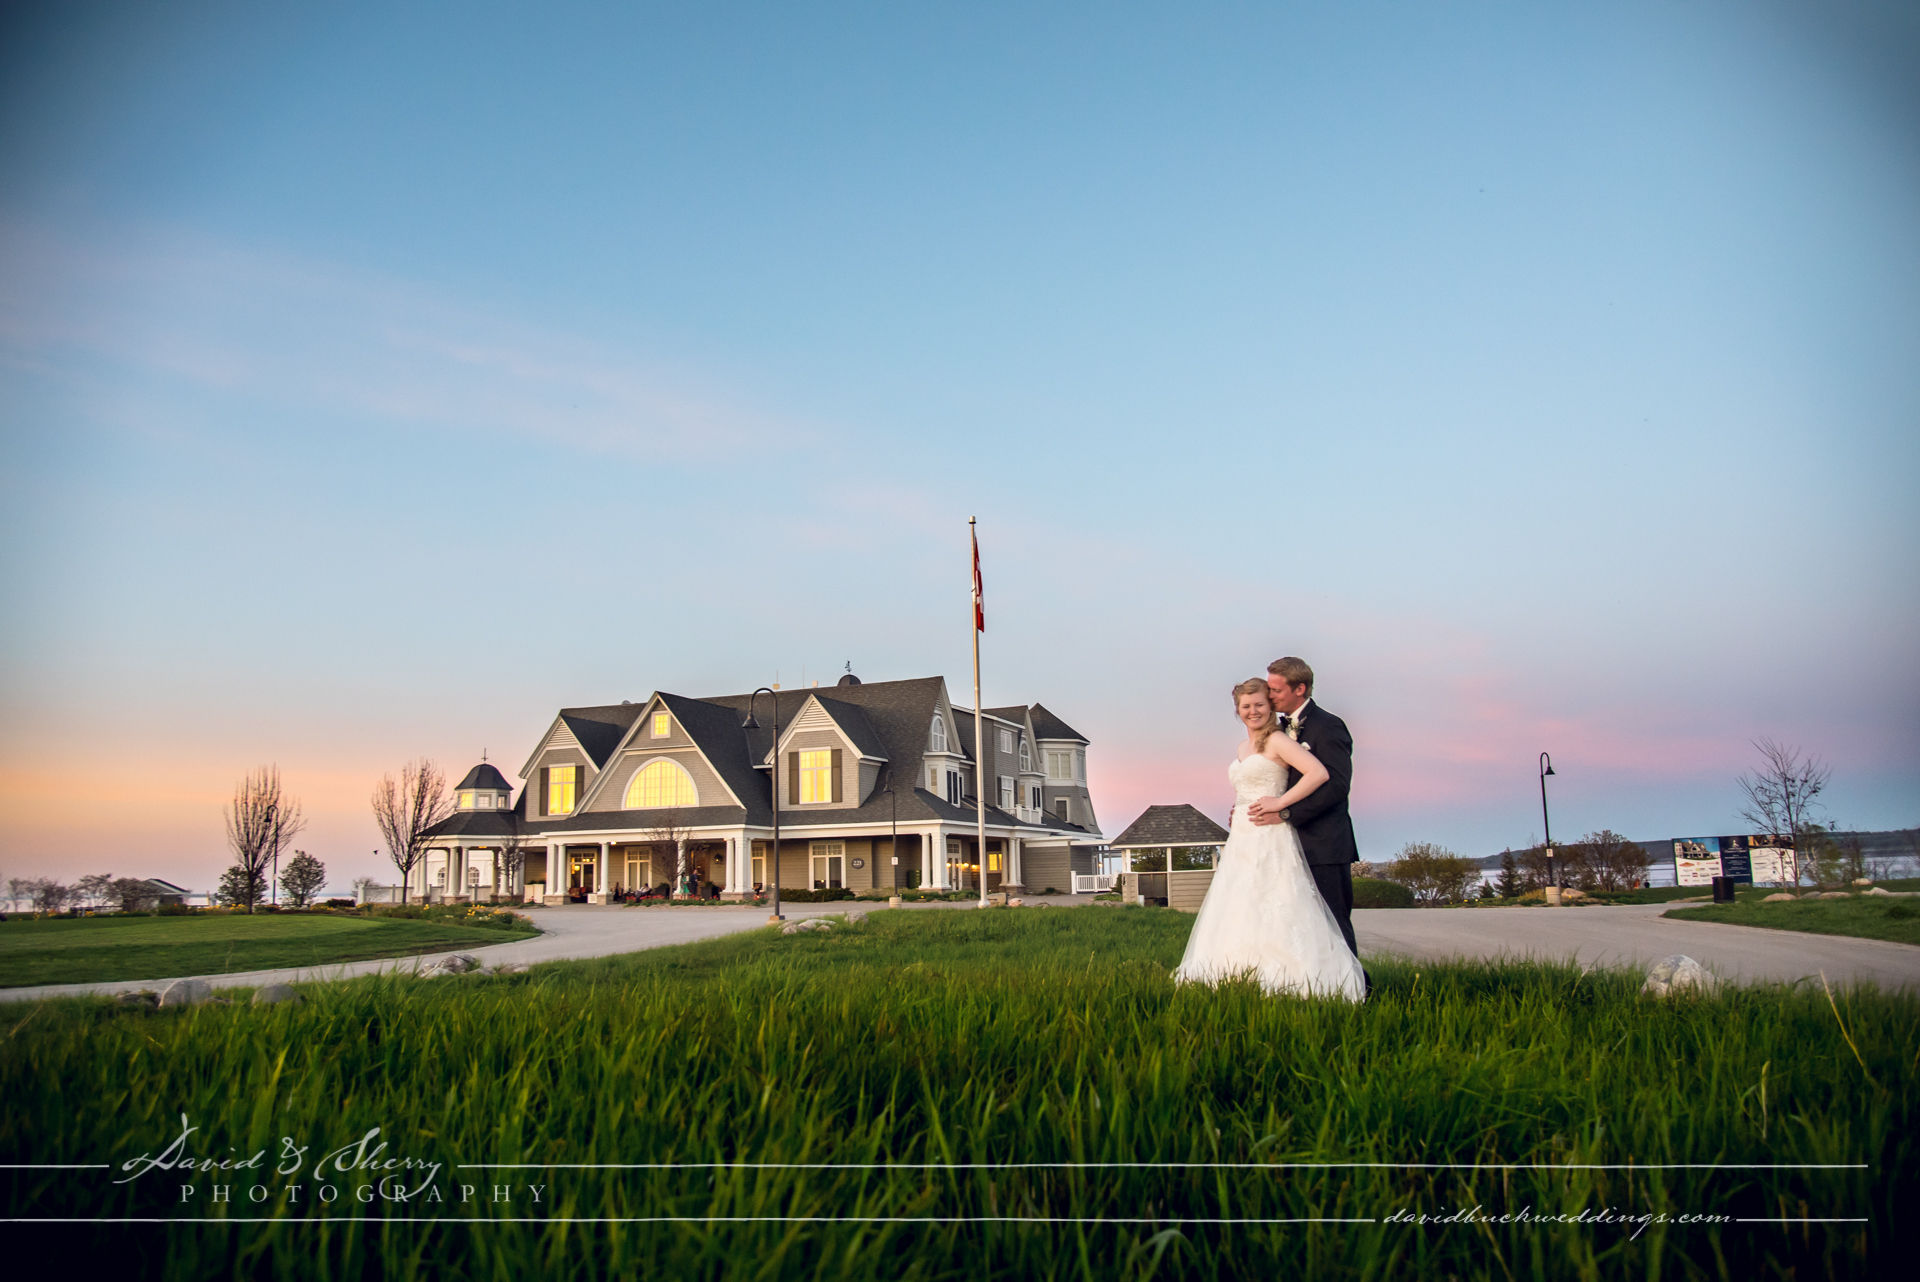 Cobble_Beach_Wedding_Photography_39